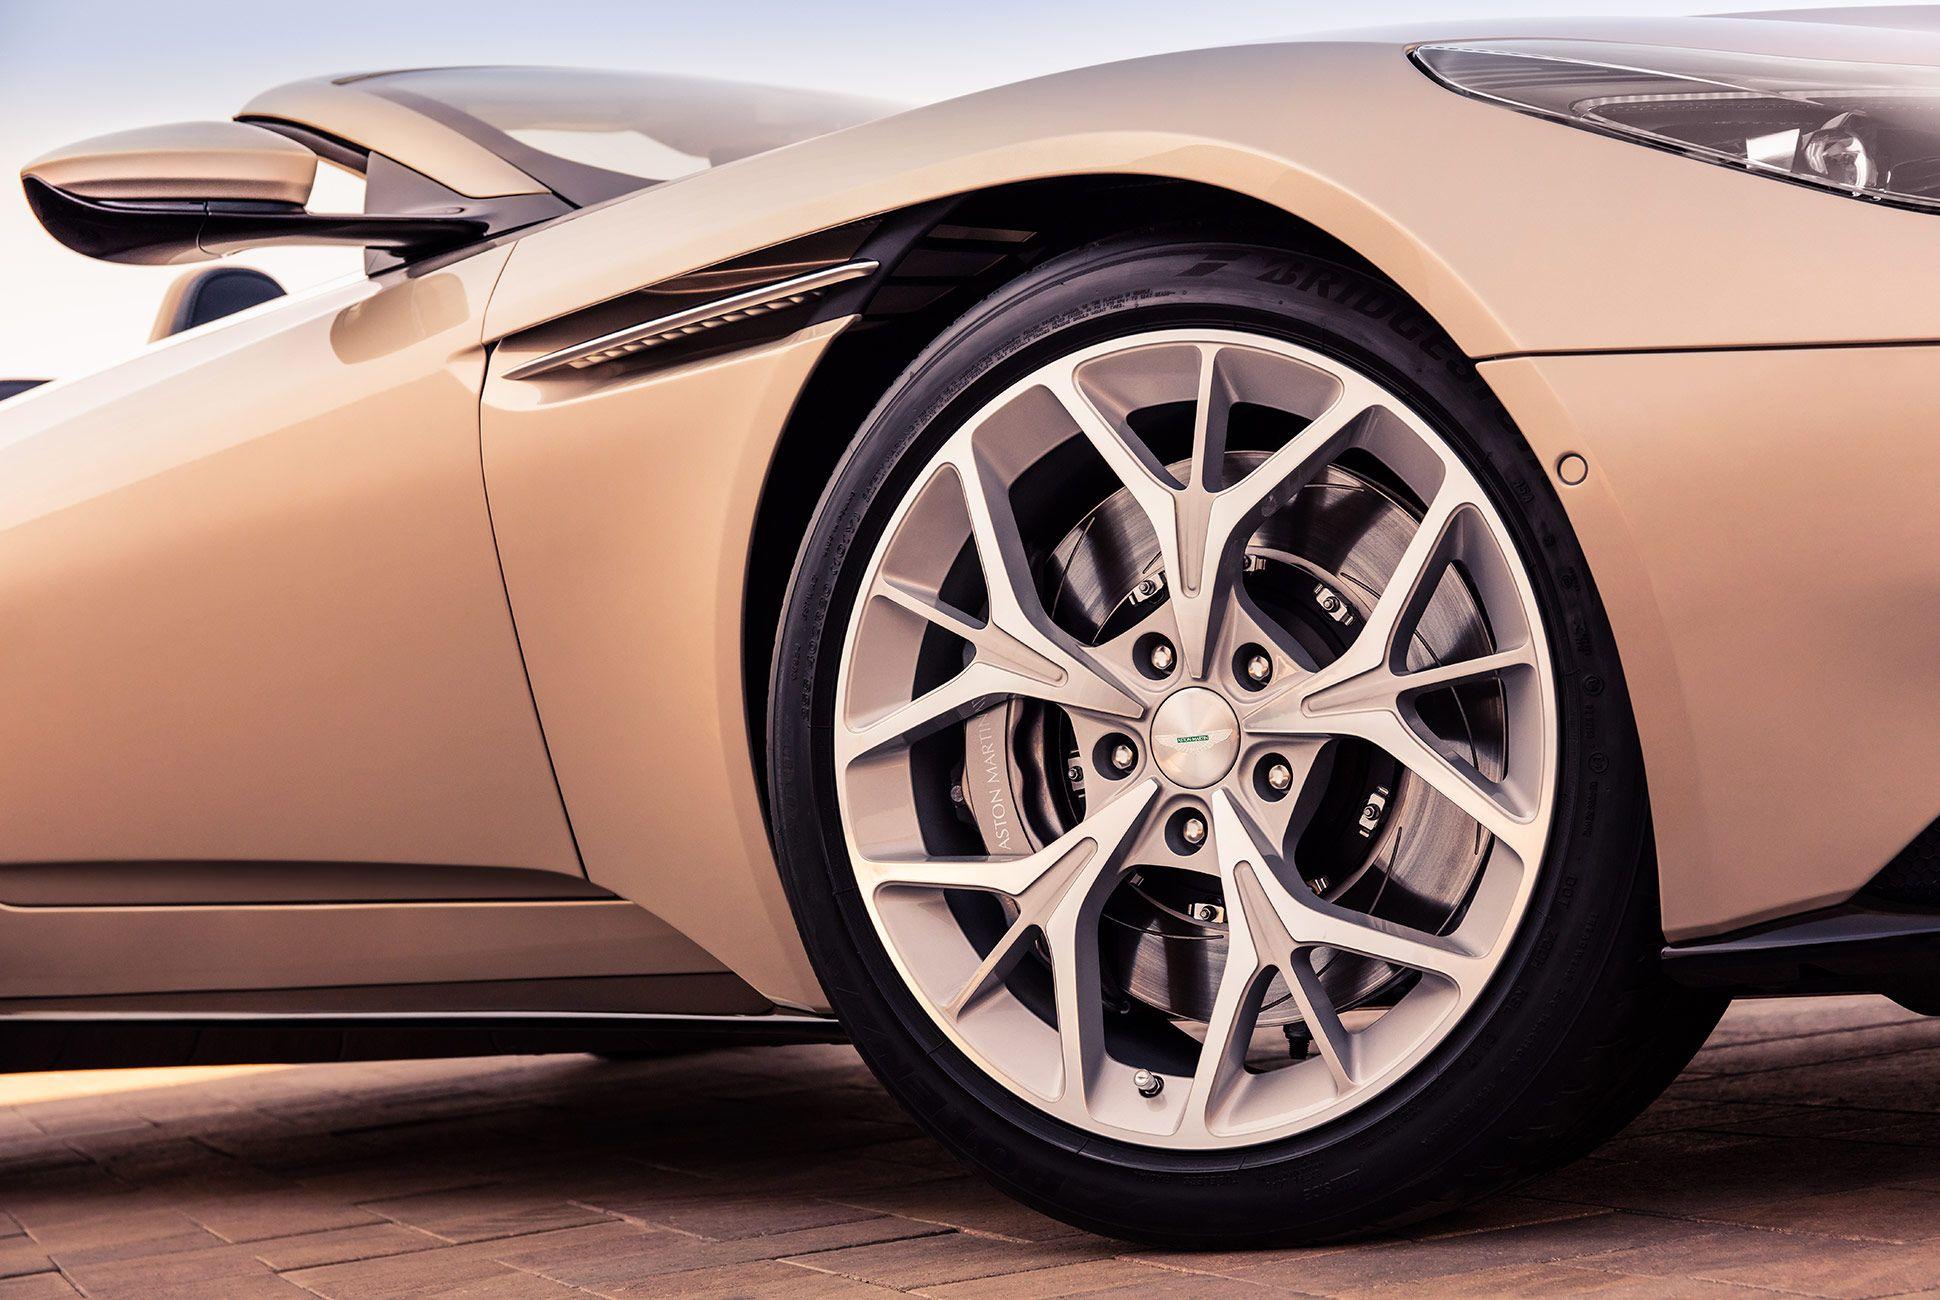 Aston-Martin-DB11-Volante-gear-patrol-10